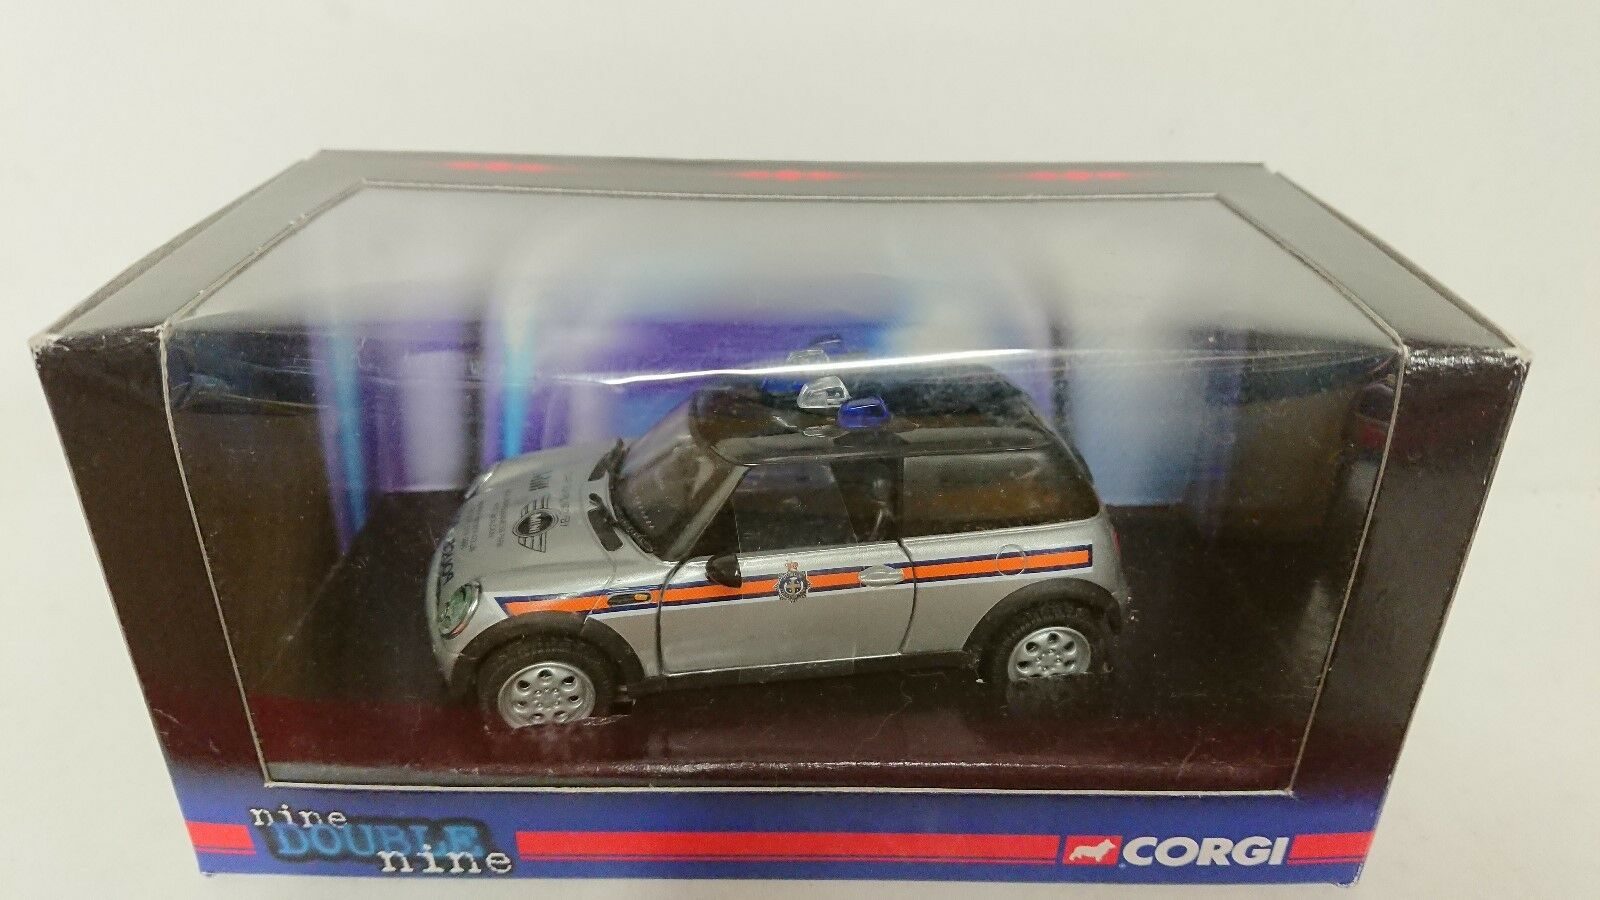 Corgi Corgi Corgi Nine Double Nine CC86519 BMW Mini Cooper Durham Police Ltd Ed 0002 of 3500 75af04